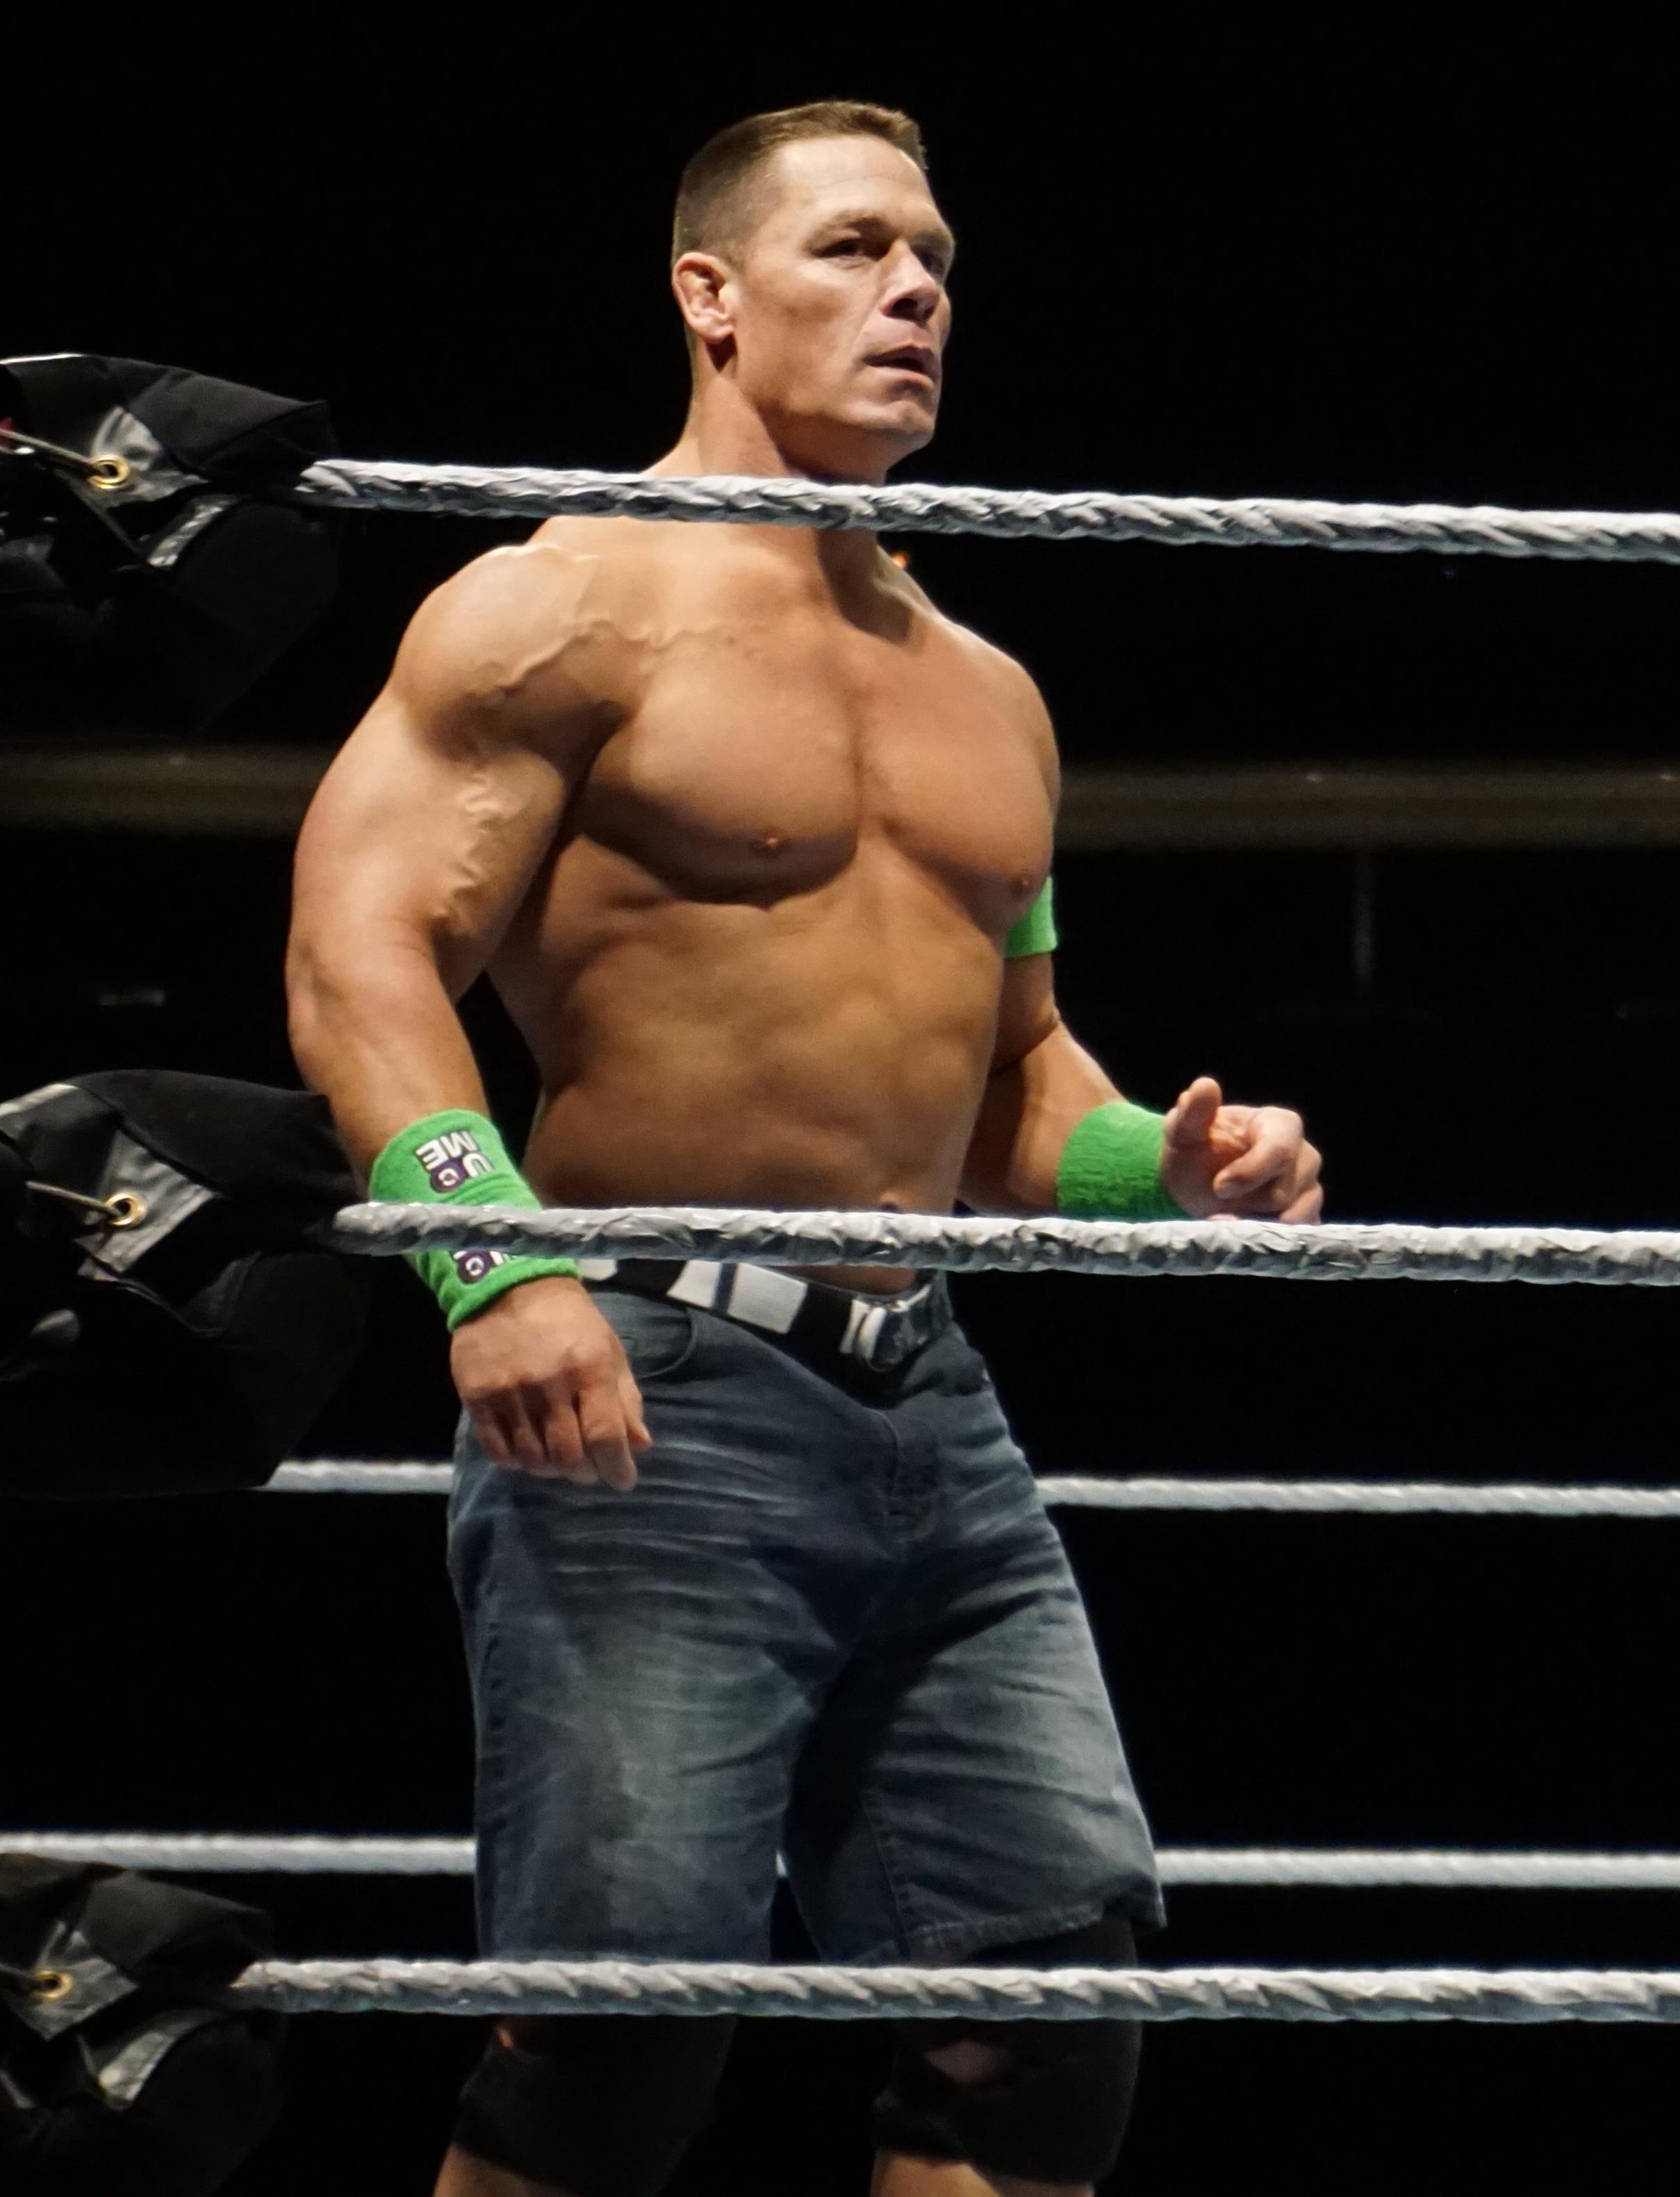 John Cena Net Worth 2018: What is this wrestler worth?